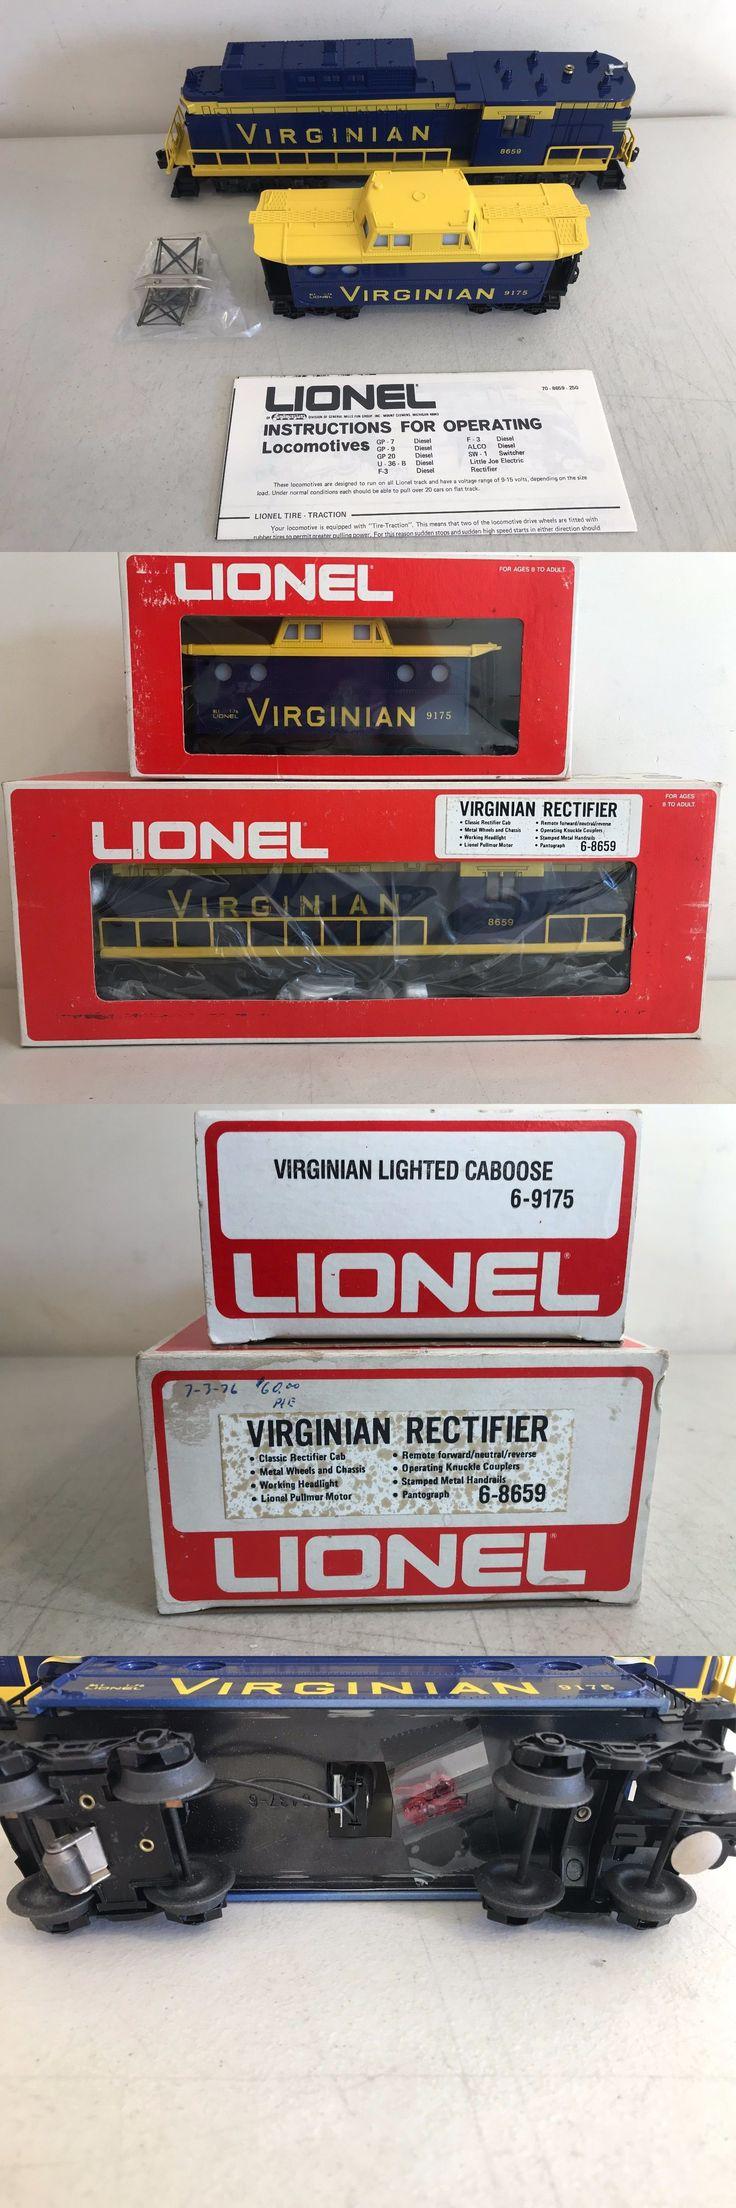 8f2648012a7fb610729da8249036ab4c diagrams 1206876 lionel transformer wiring  diagram lionel kw lionel 1033 transformer wiring